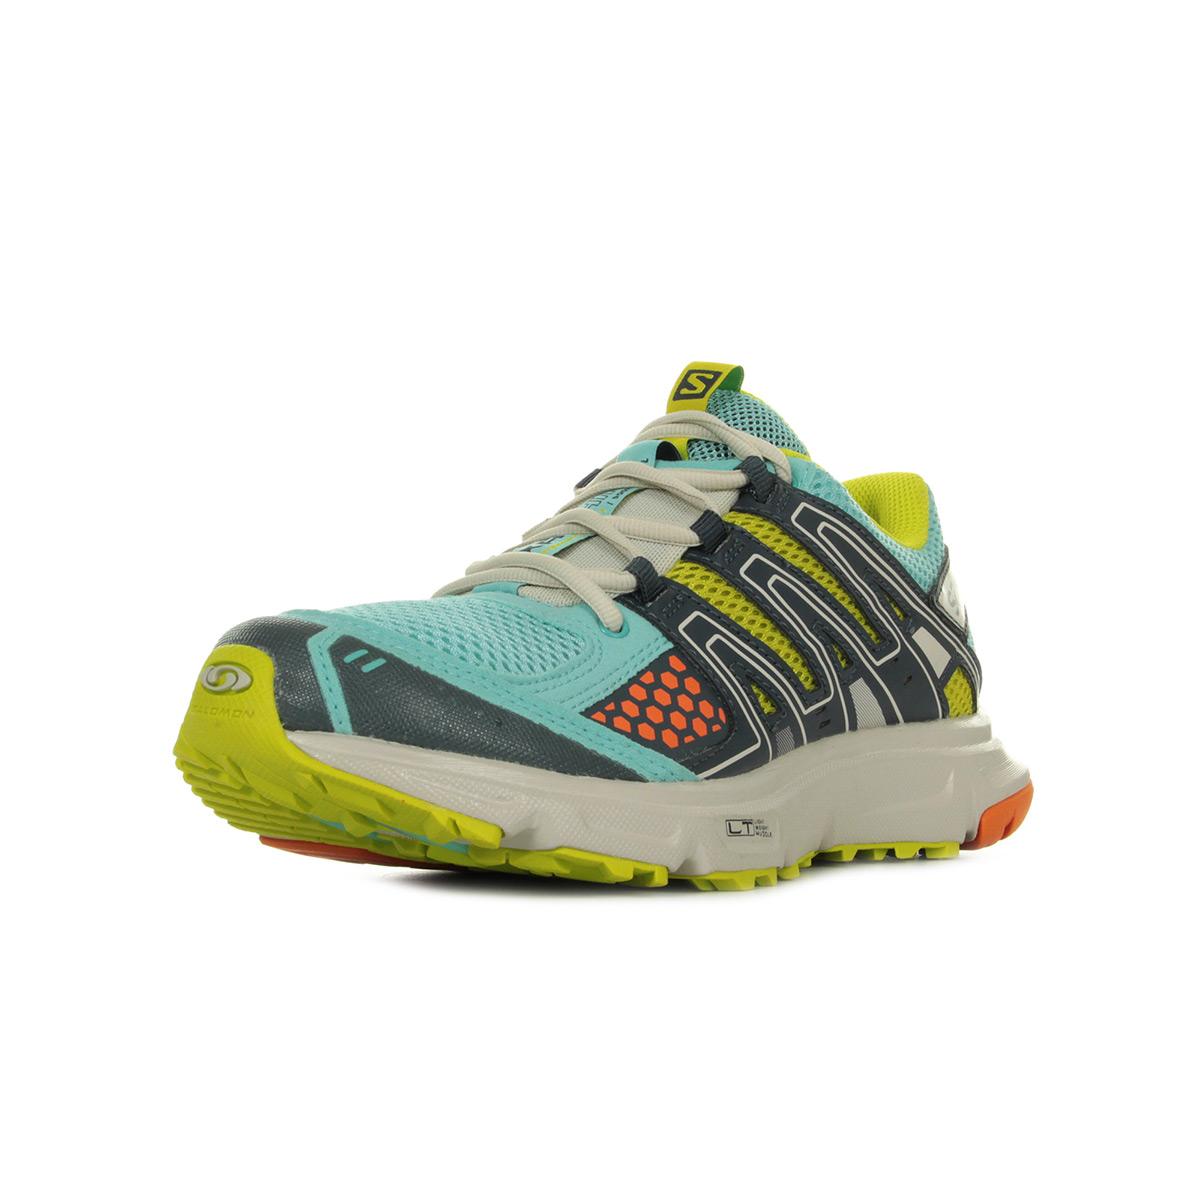 Chaussures Salomon femme Xr Shift W Running taille Gris Grise ... 34b49b84b6